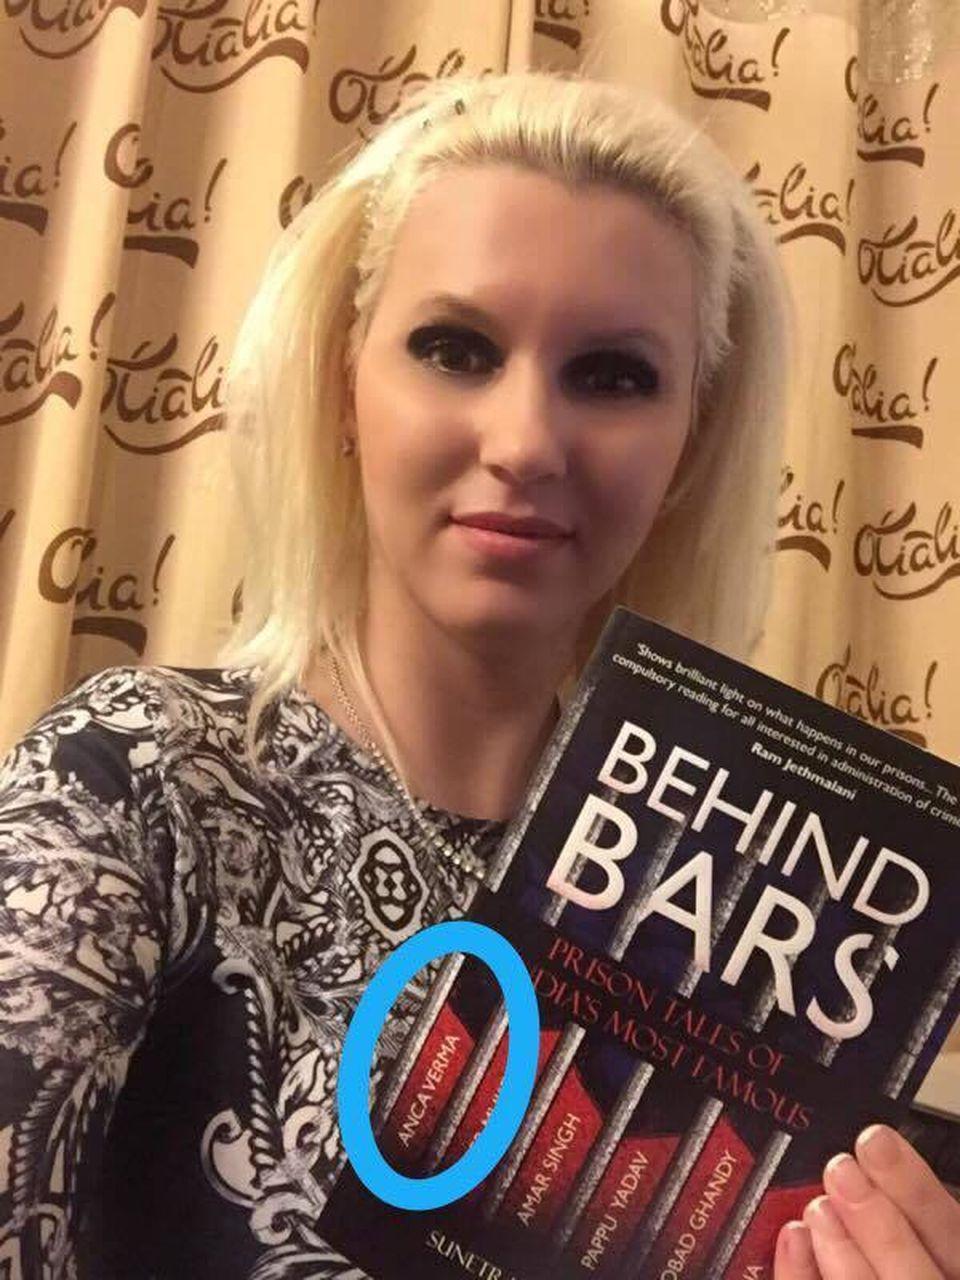 Miliardara romanca, dezvaluiri despre cosmarul trait in inchisorile din India! Anca Verma, fosta Miss Romania, este vedeta unui roman best-seller in Asia